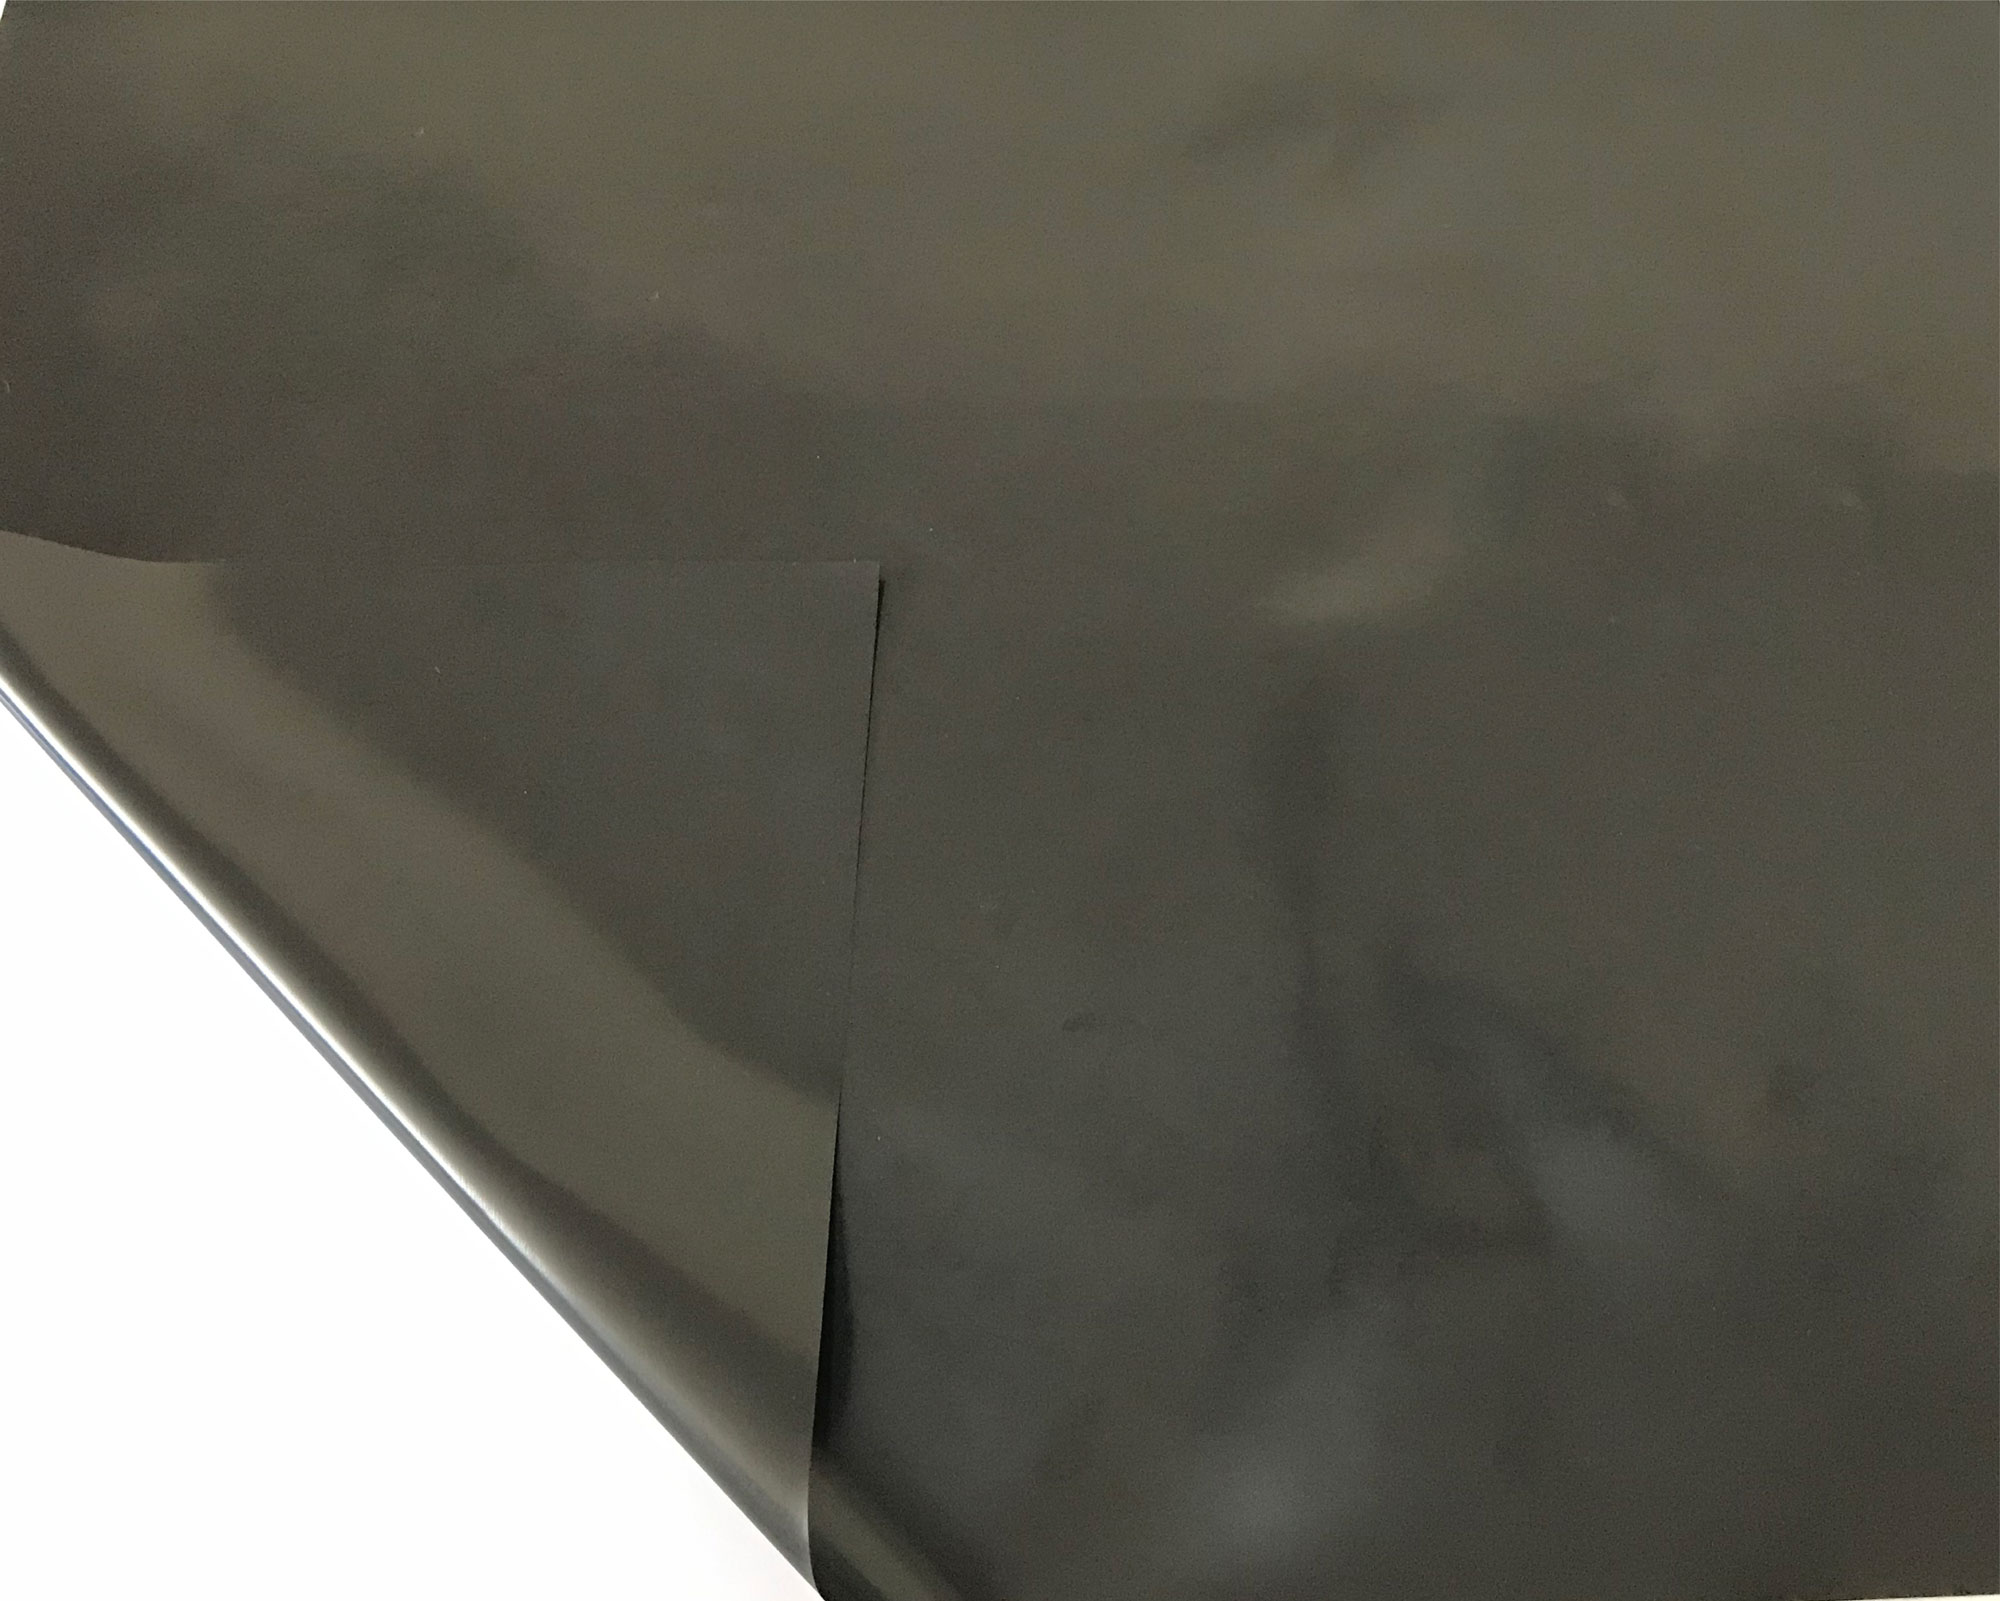 Lona Geomembrana + Manta Bidim 300 Micras - 6x12